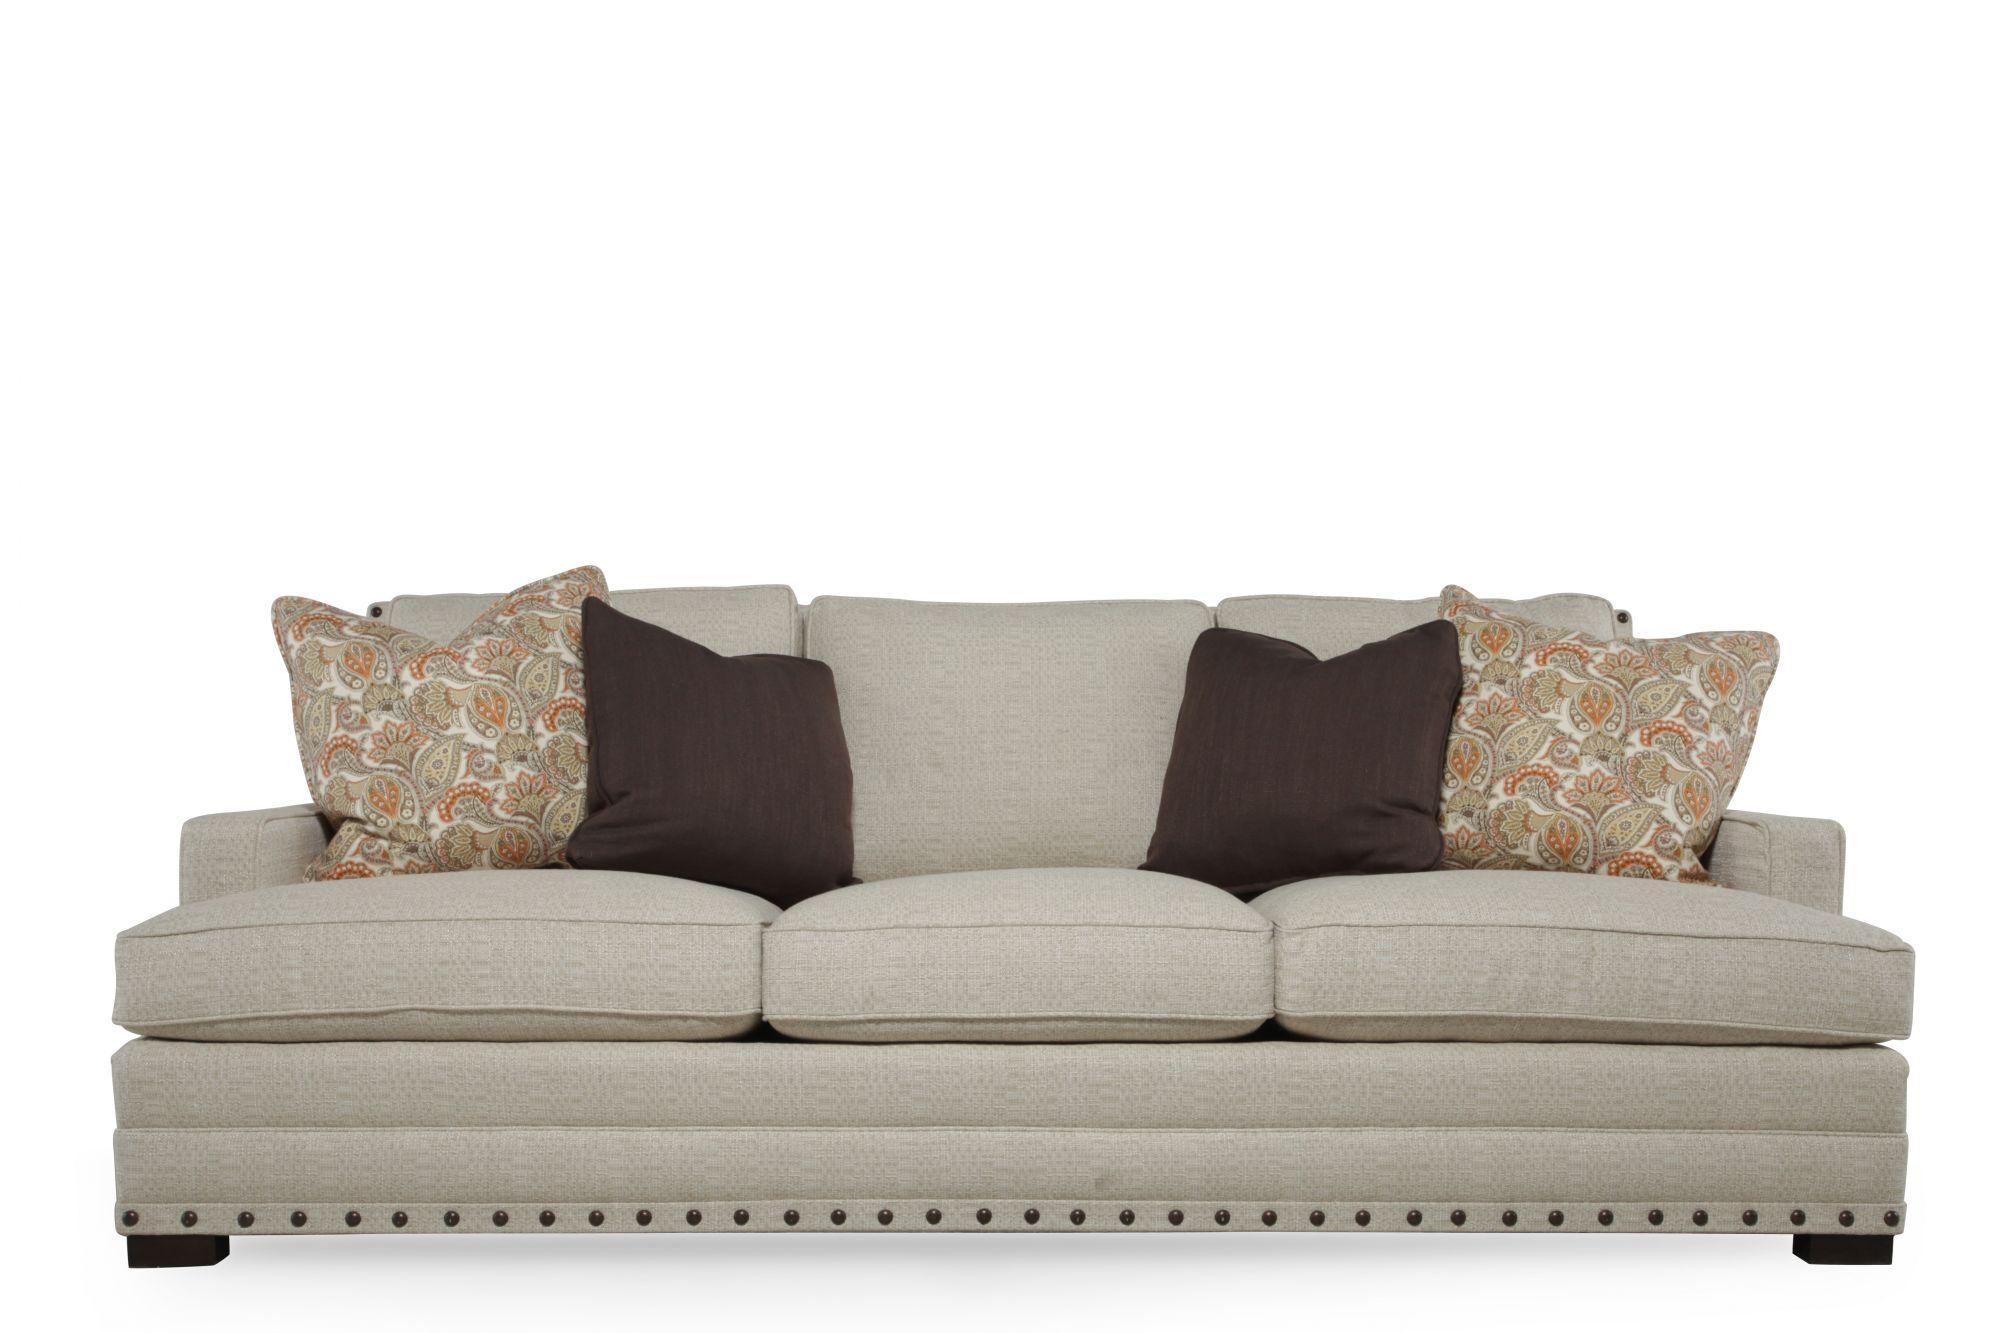 Bernhardt Furniture Sofa | Sofa Gallery | Kengire in Bernhardt Tarleton Sofas